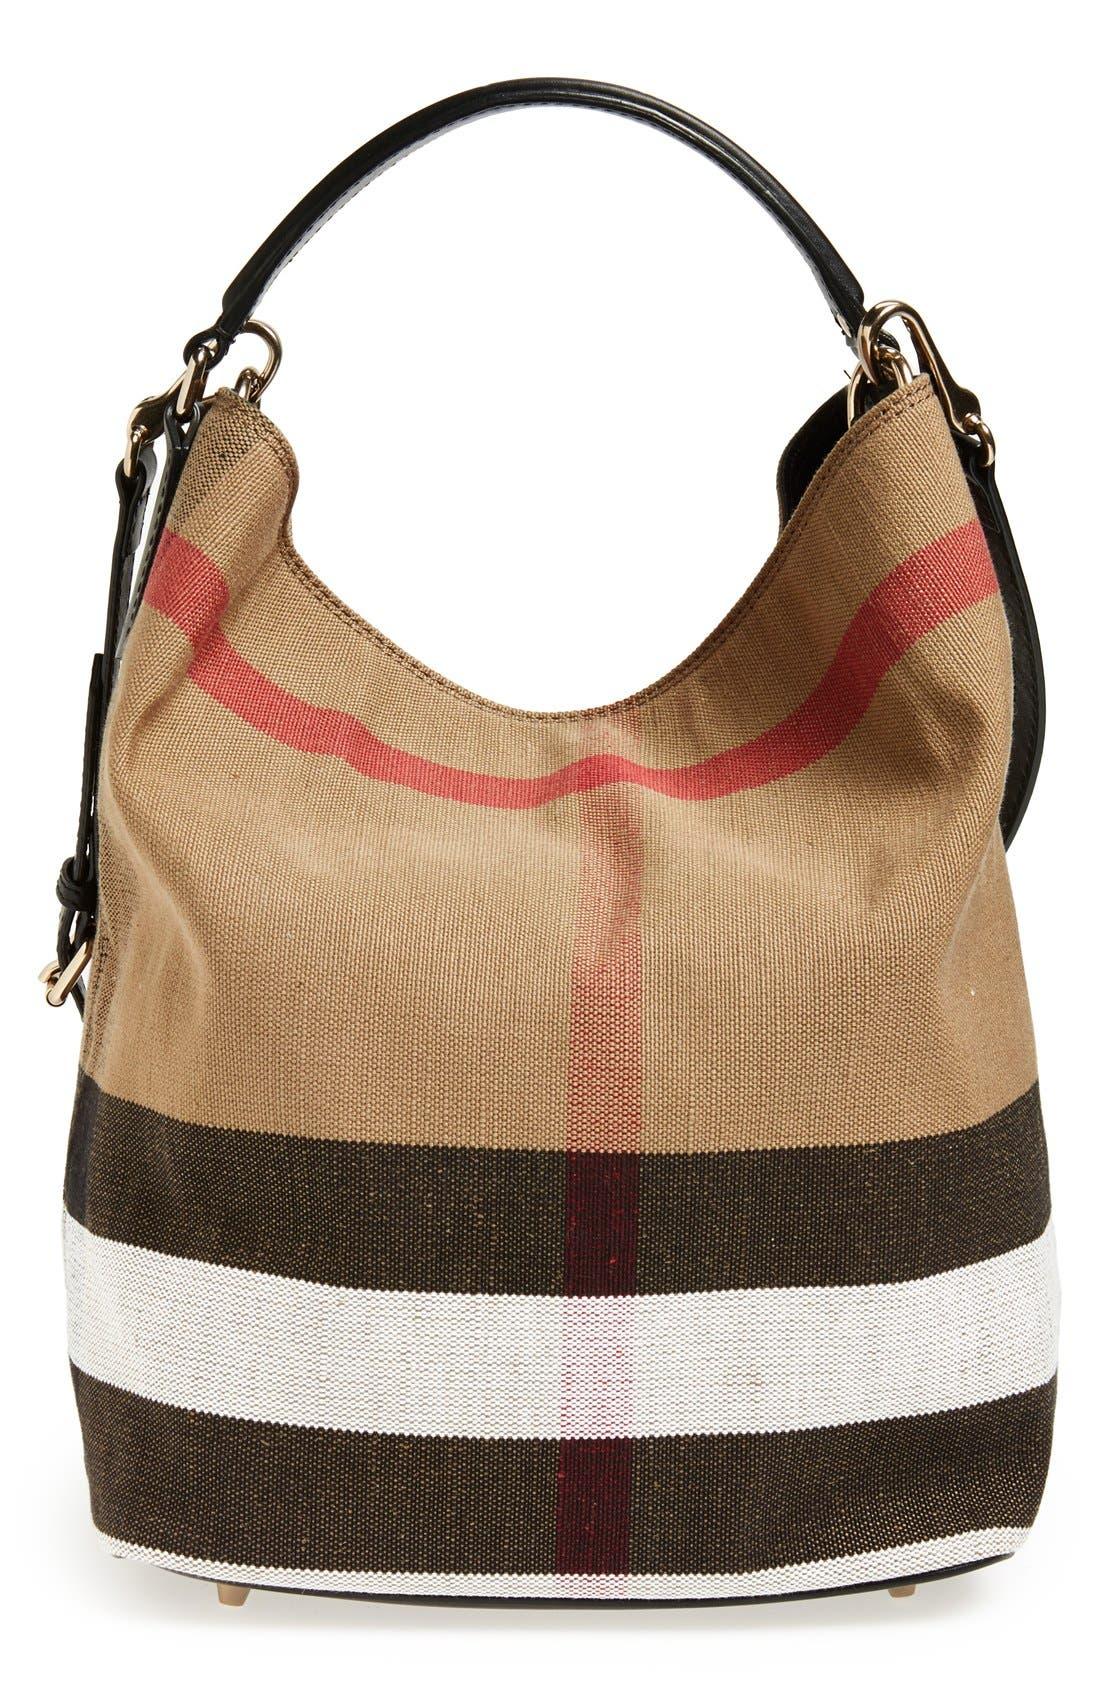 Medium Susanna Check Print Bucket Bag,                         Main,                         color, Black